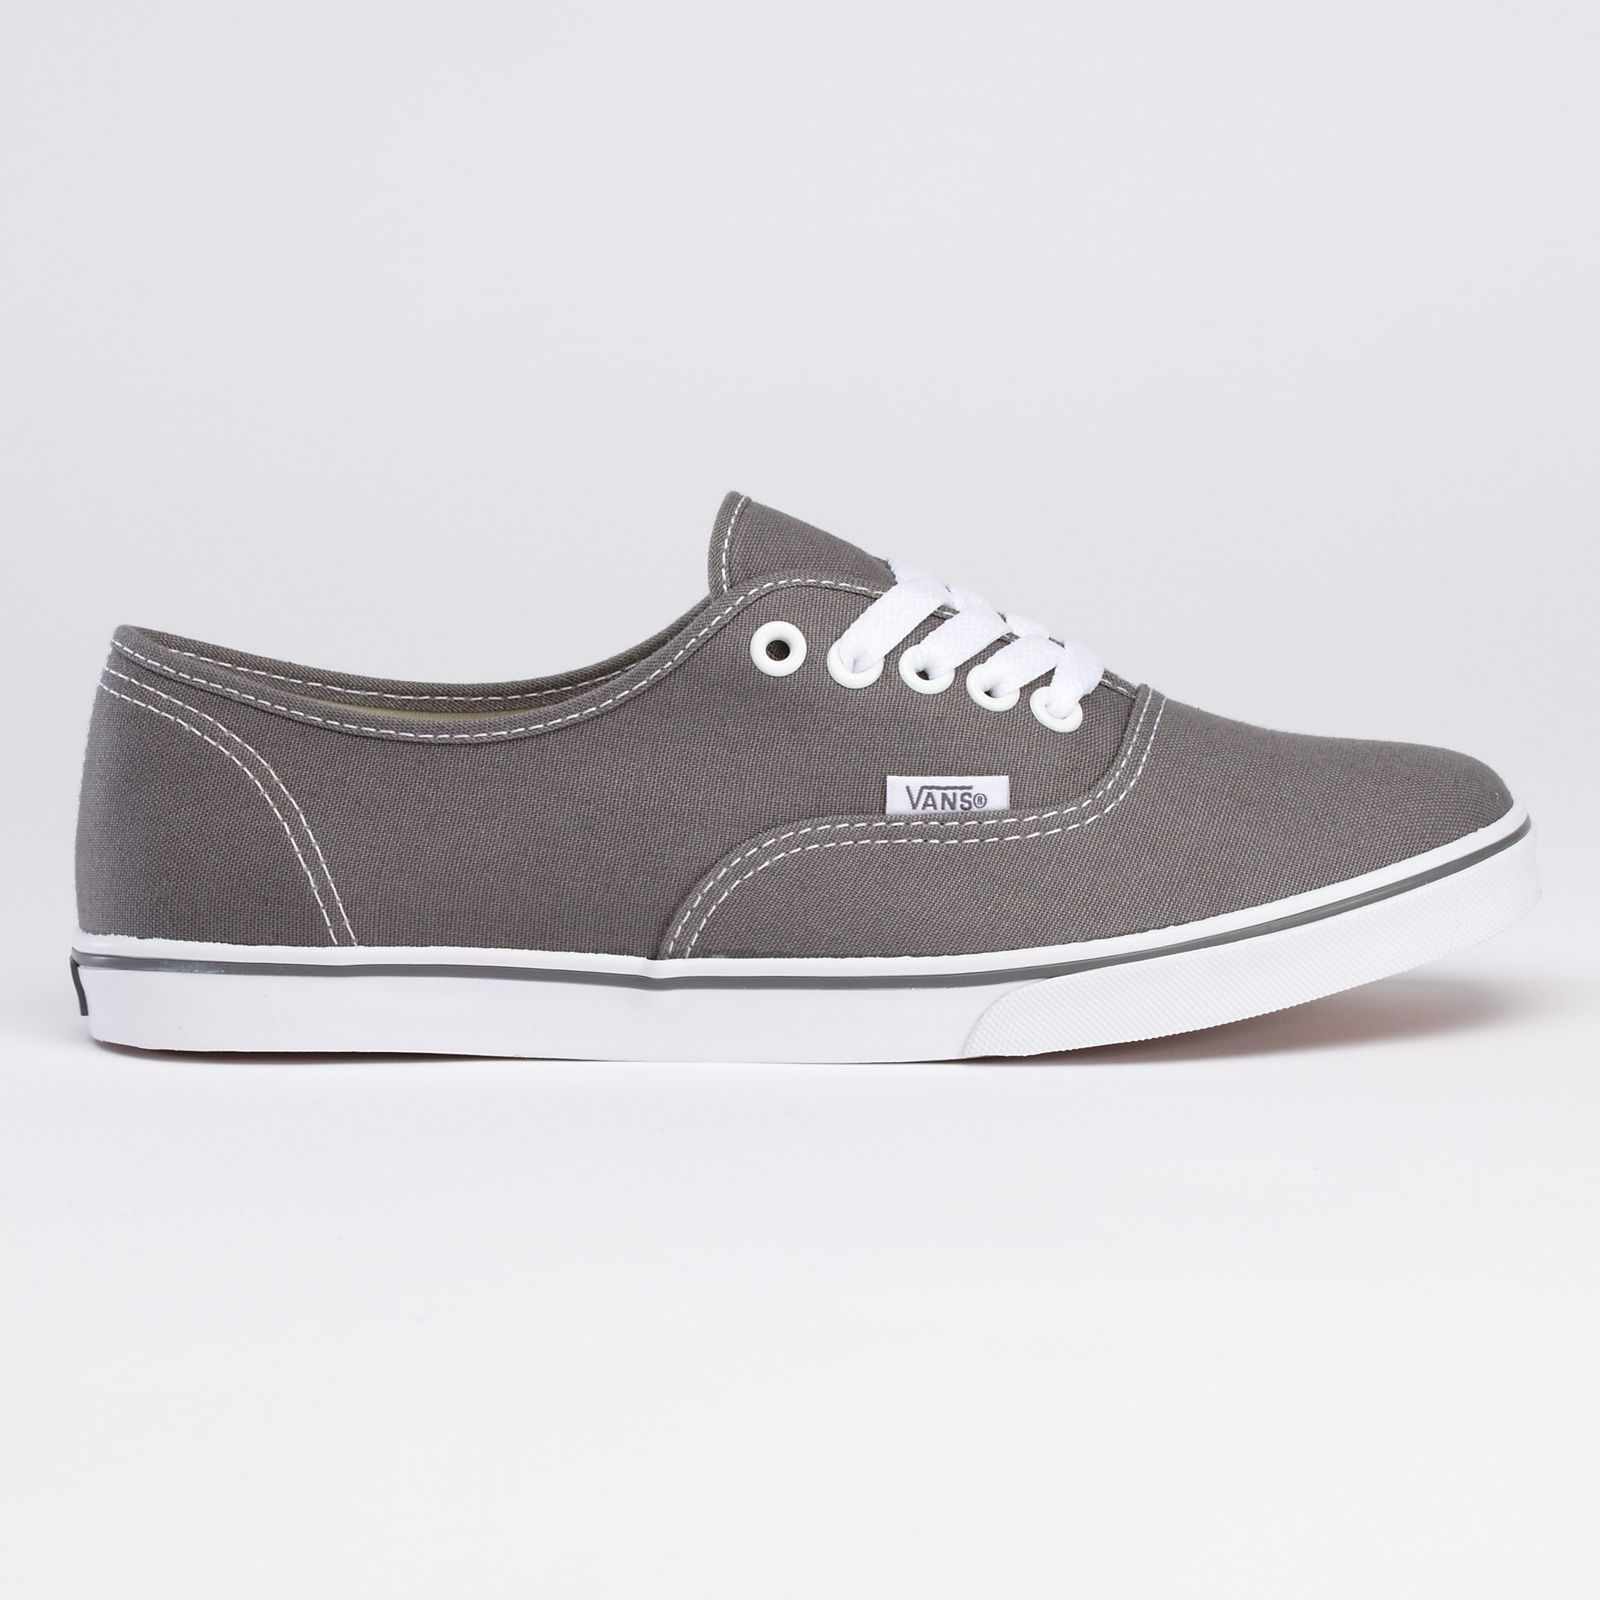 need. these. | Zapatos, Ropa, Moda